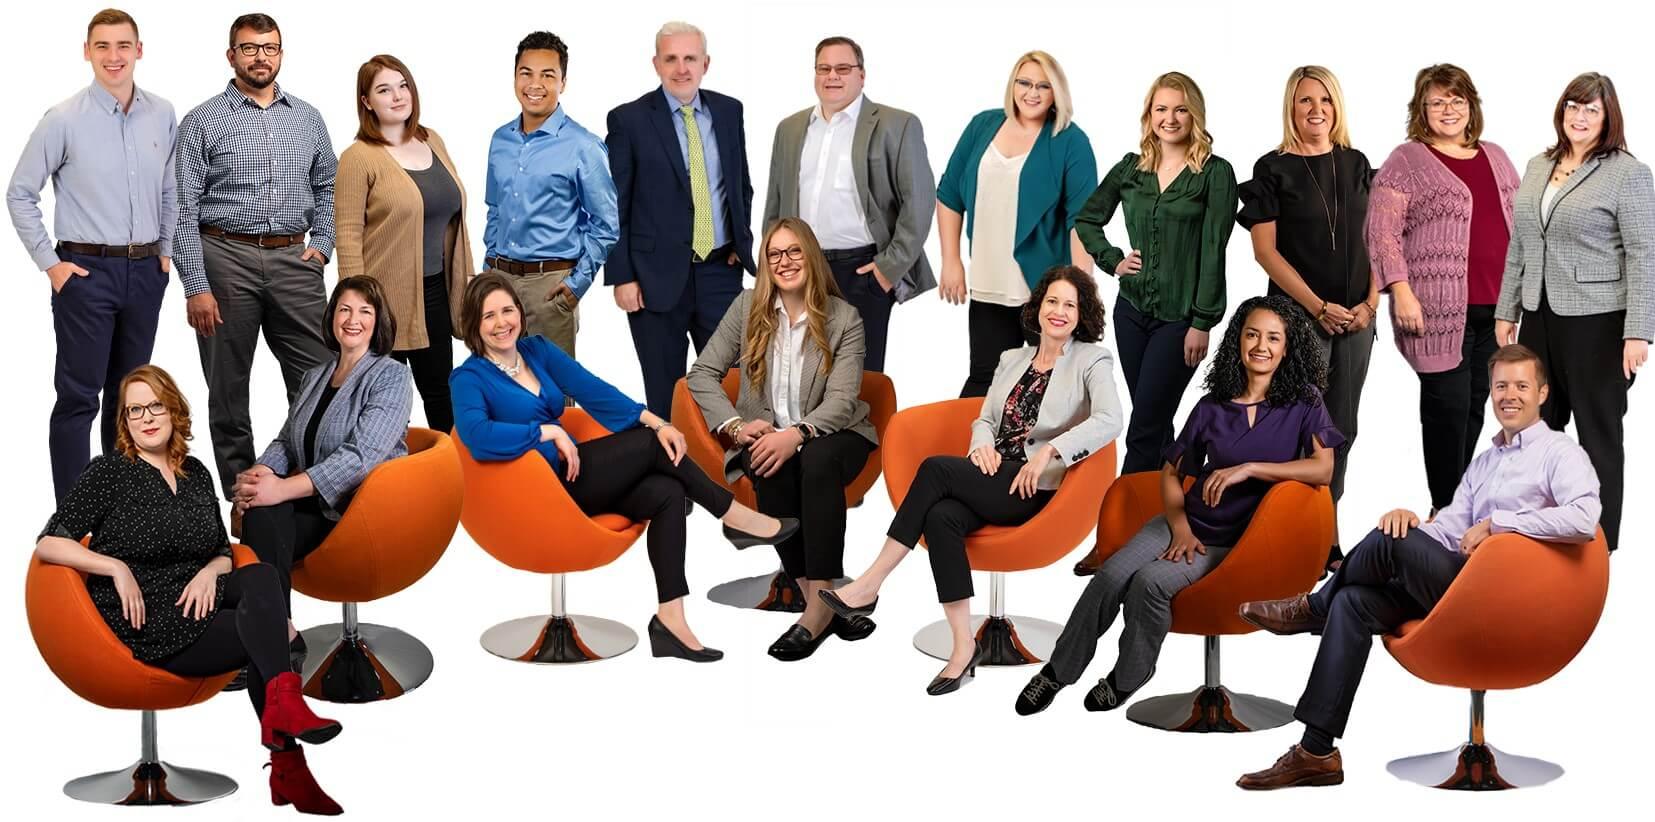 Public Relations & Marketing Team in Louisville KY